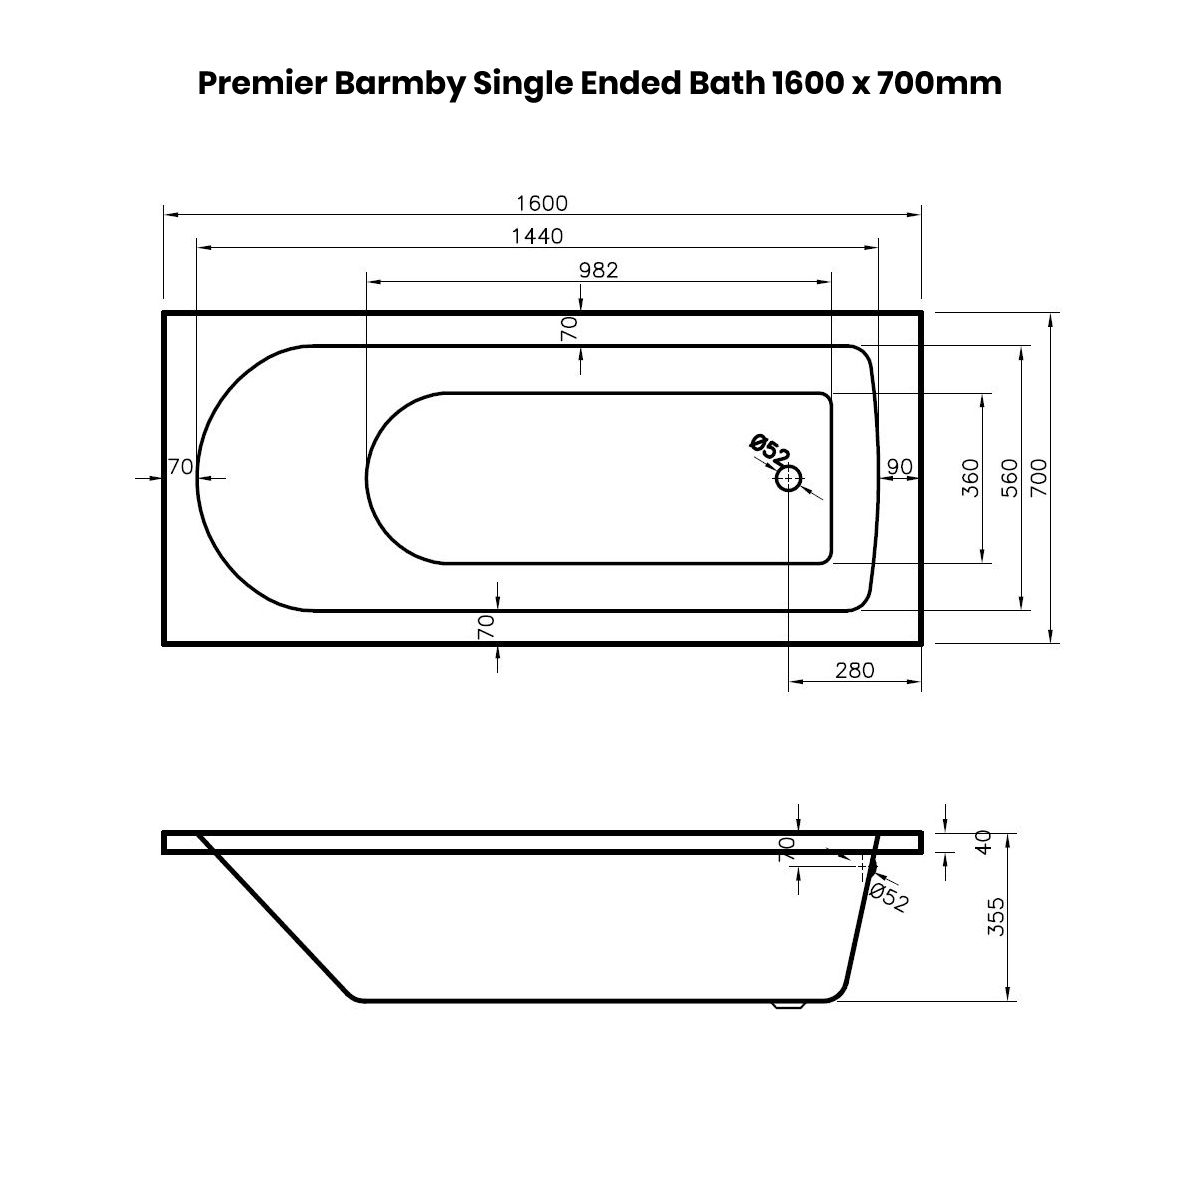 Premier Barmby Single Ended Bath 1600 x 700mm Dimensions